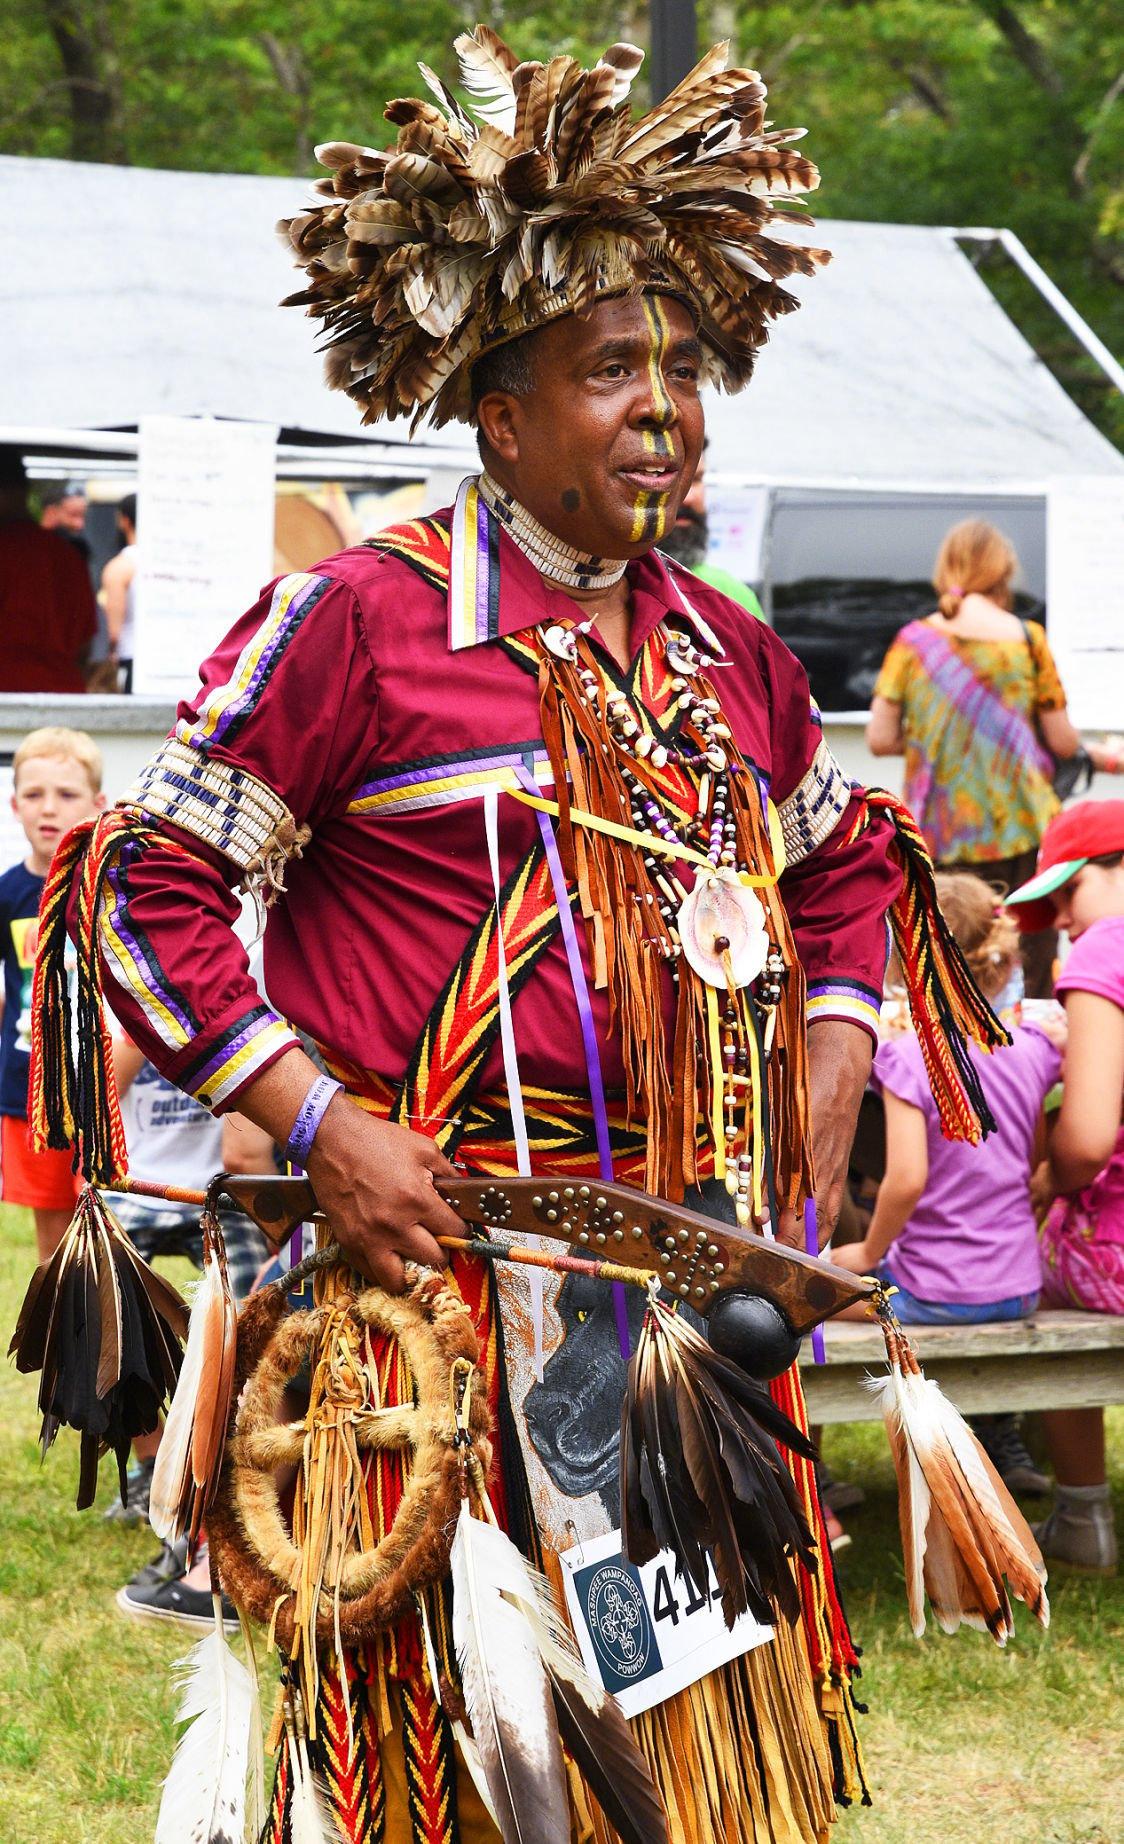 98th Annual Mashpee Wampanoag Powwow